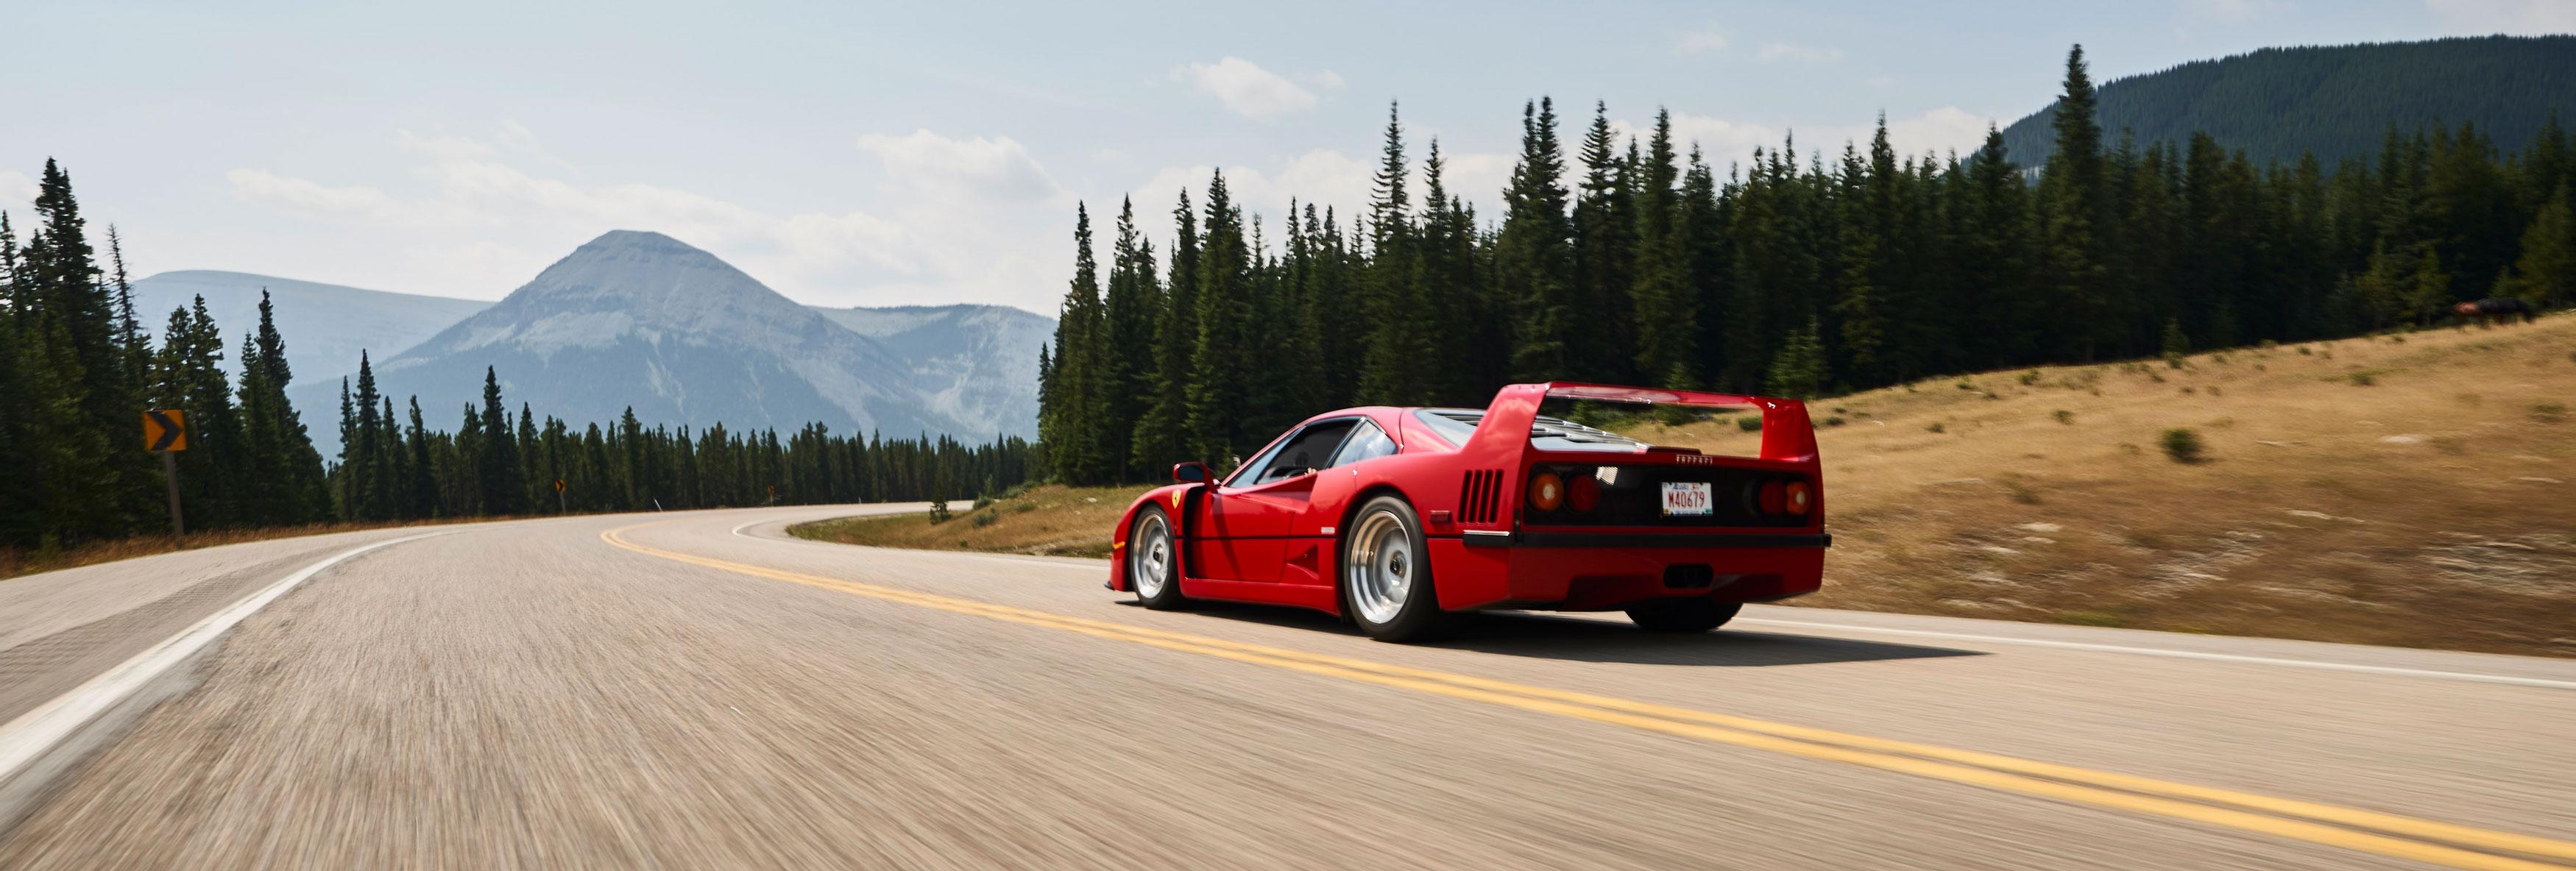 Brendan McAleer driving his dream car, a Ferrari F40